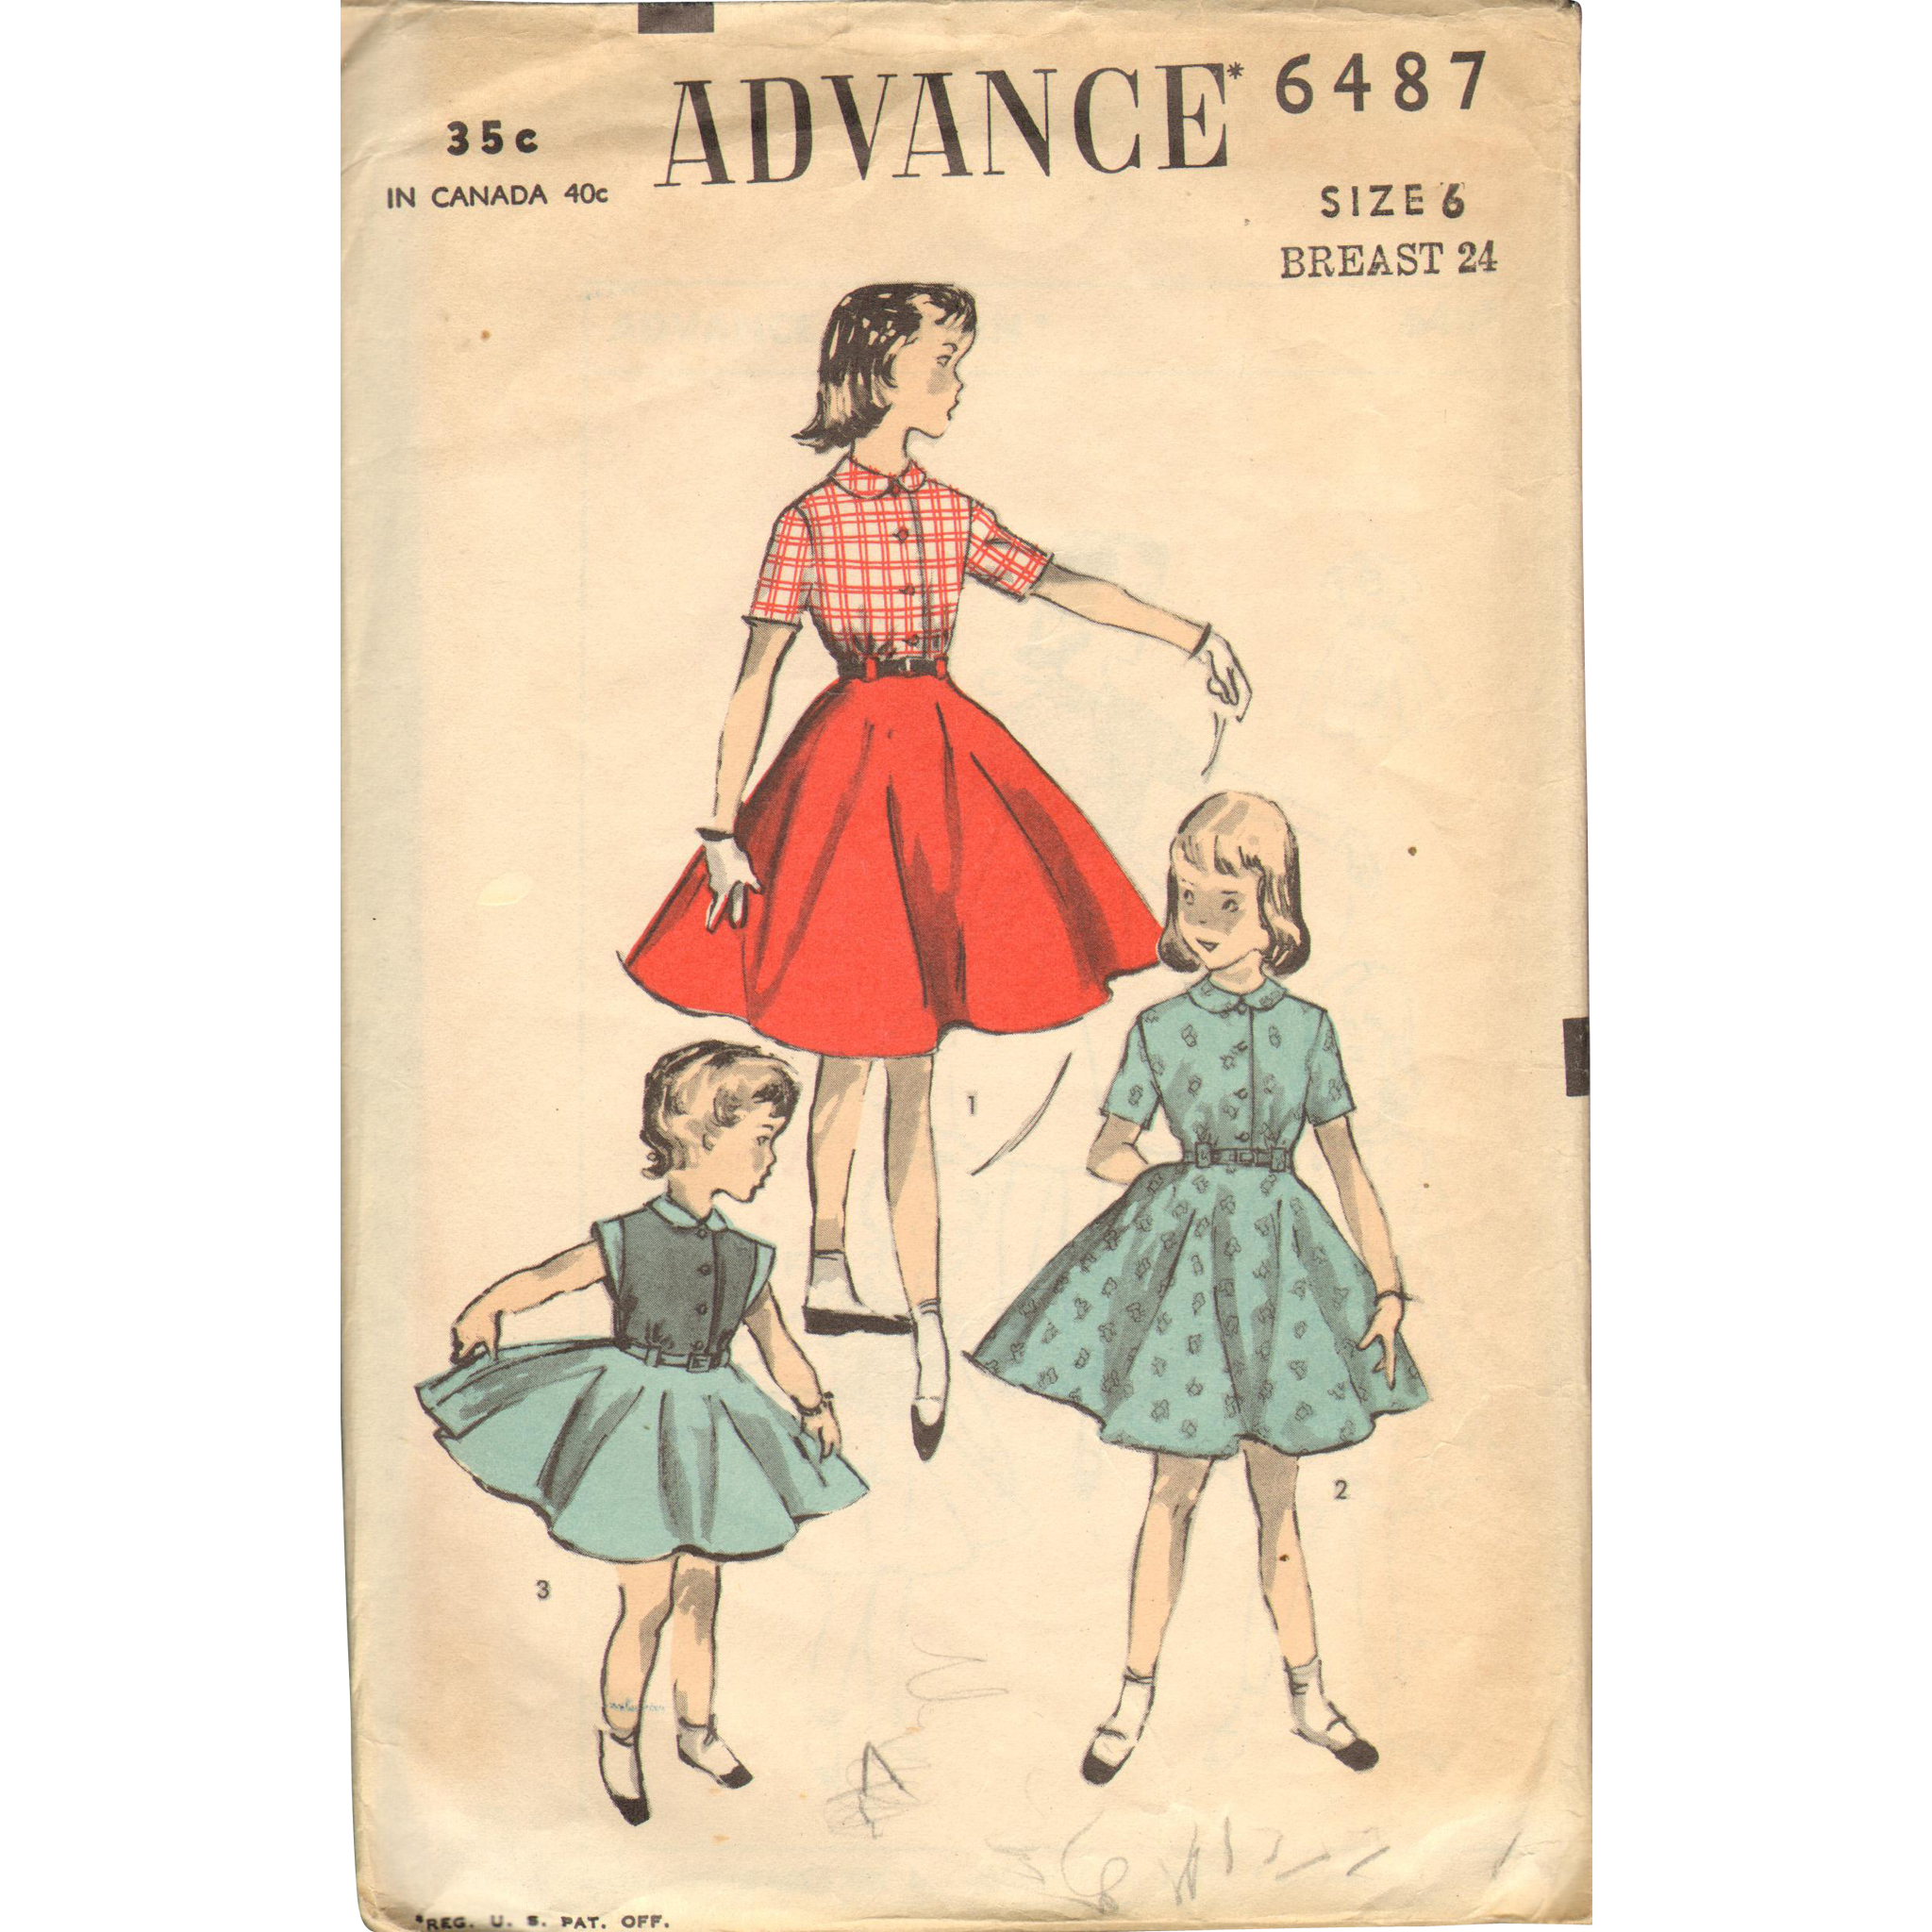 Advance 6487 Vintage Sewing Pattern Girls Dress Shirtwaist Top 1940s ...